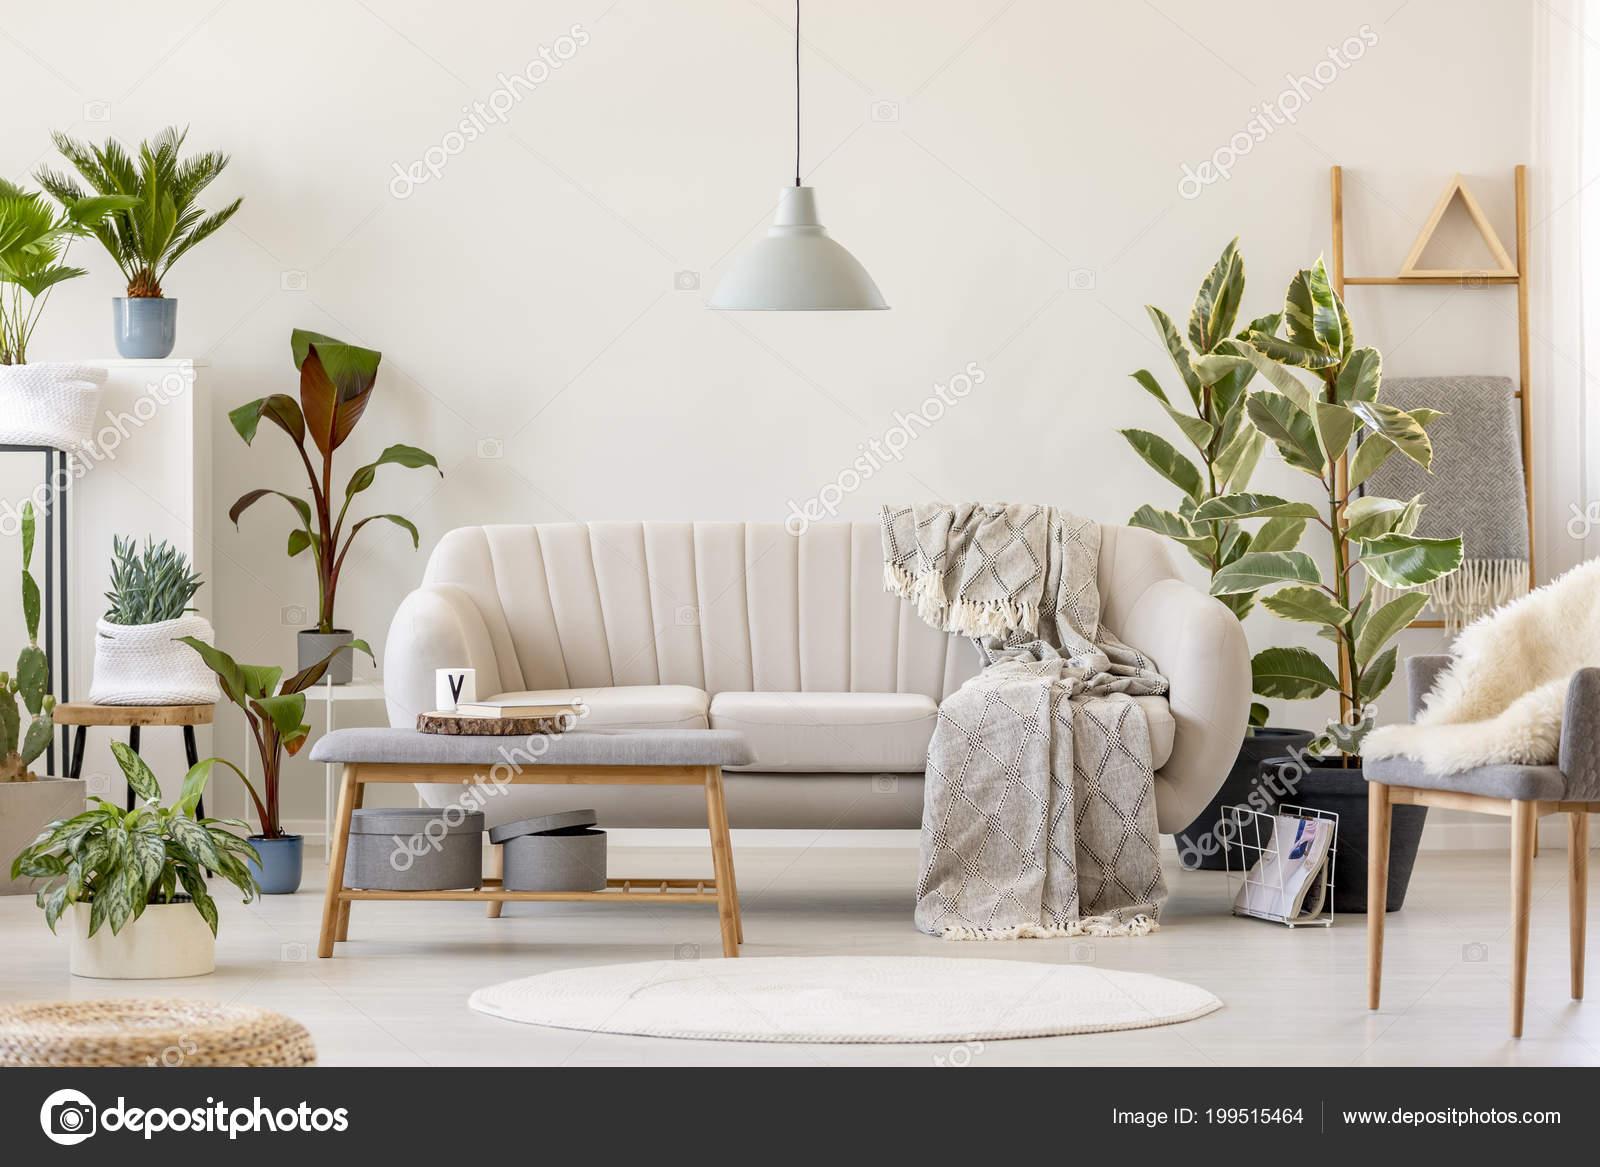 deken beige bankstel onder grijs lamp floral woonkamer interieur met stockfoto